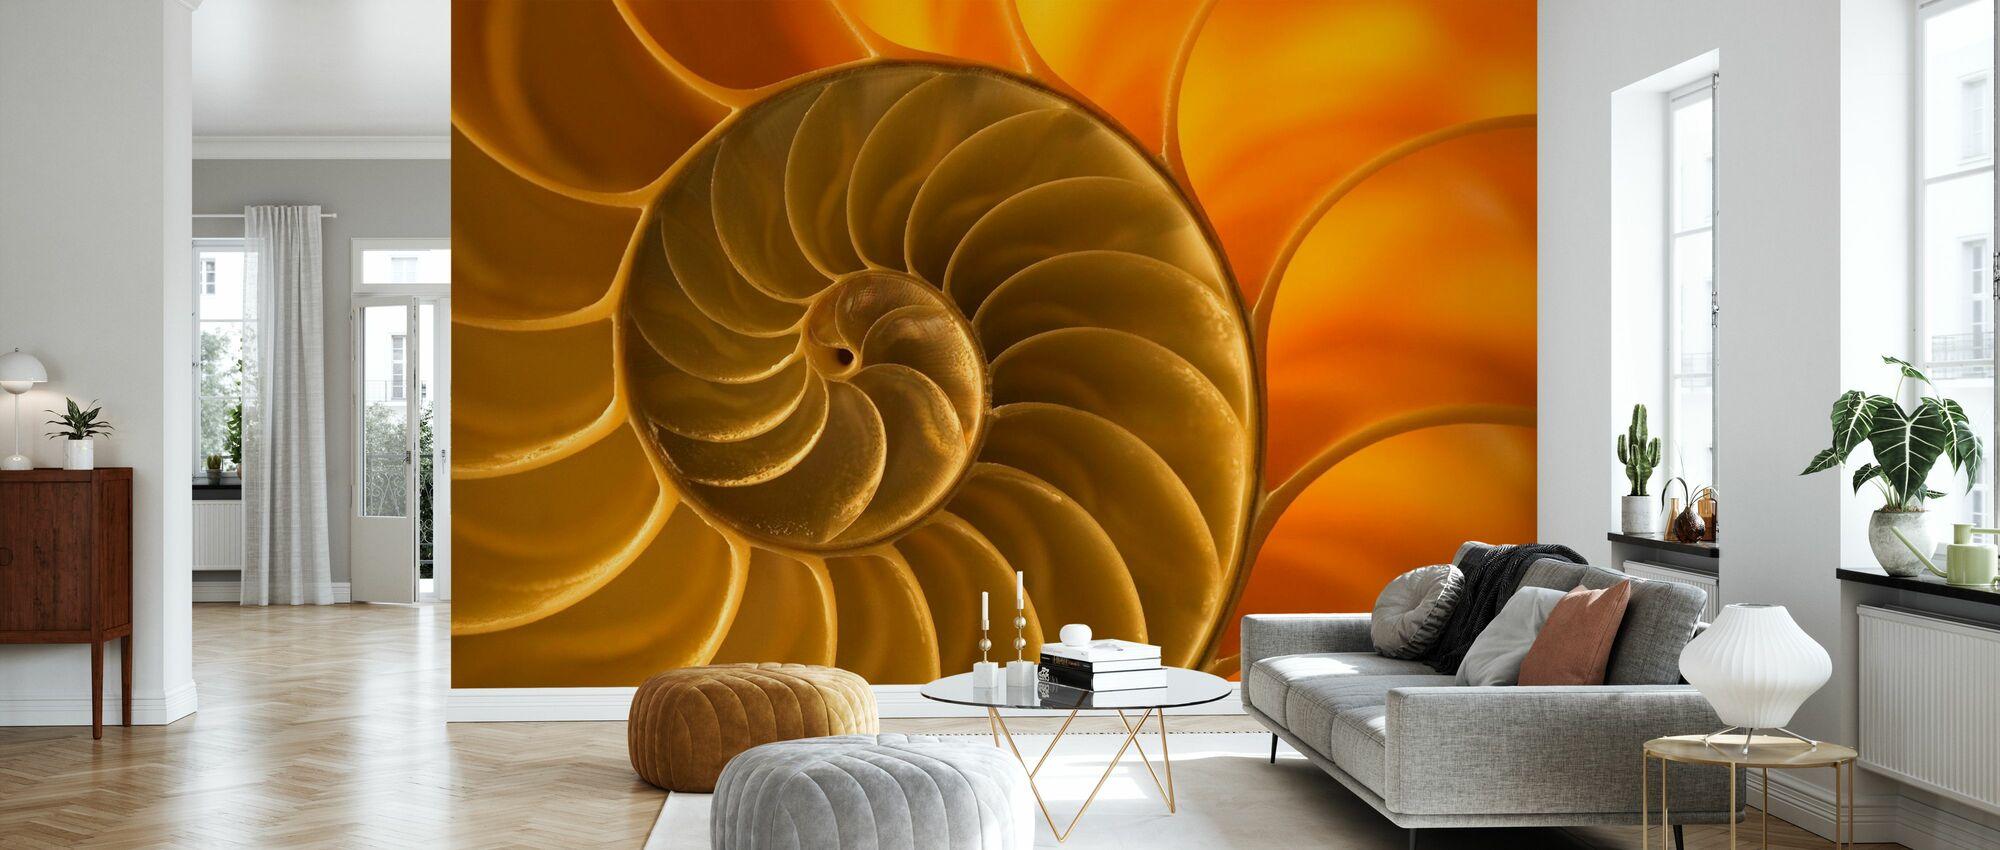 Nautilus Shell - Wallpaper - Living Room